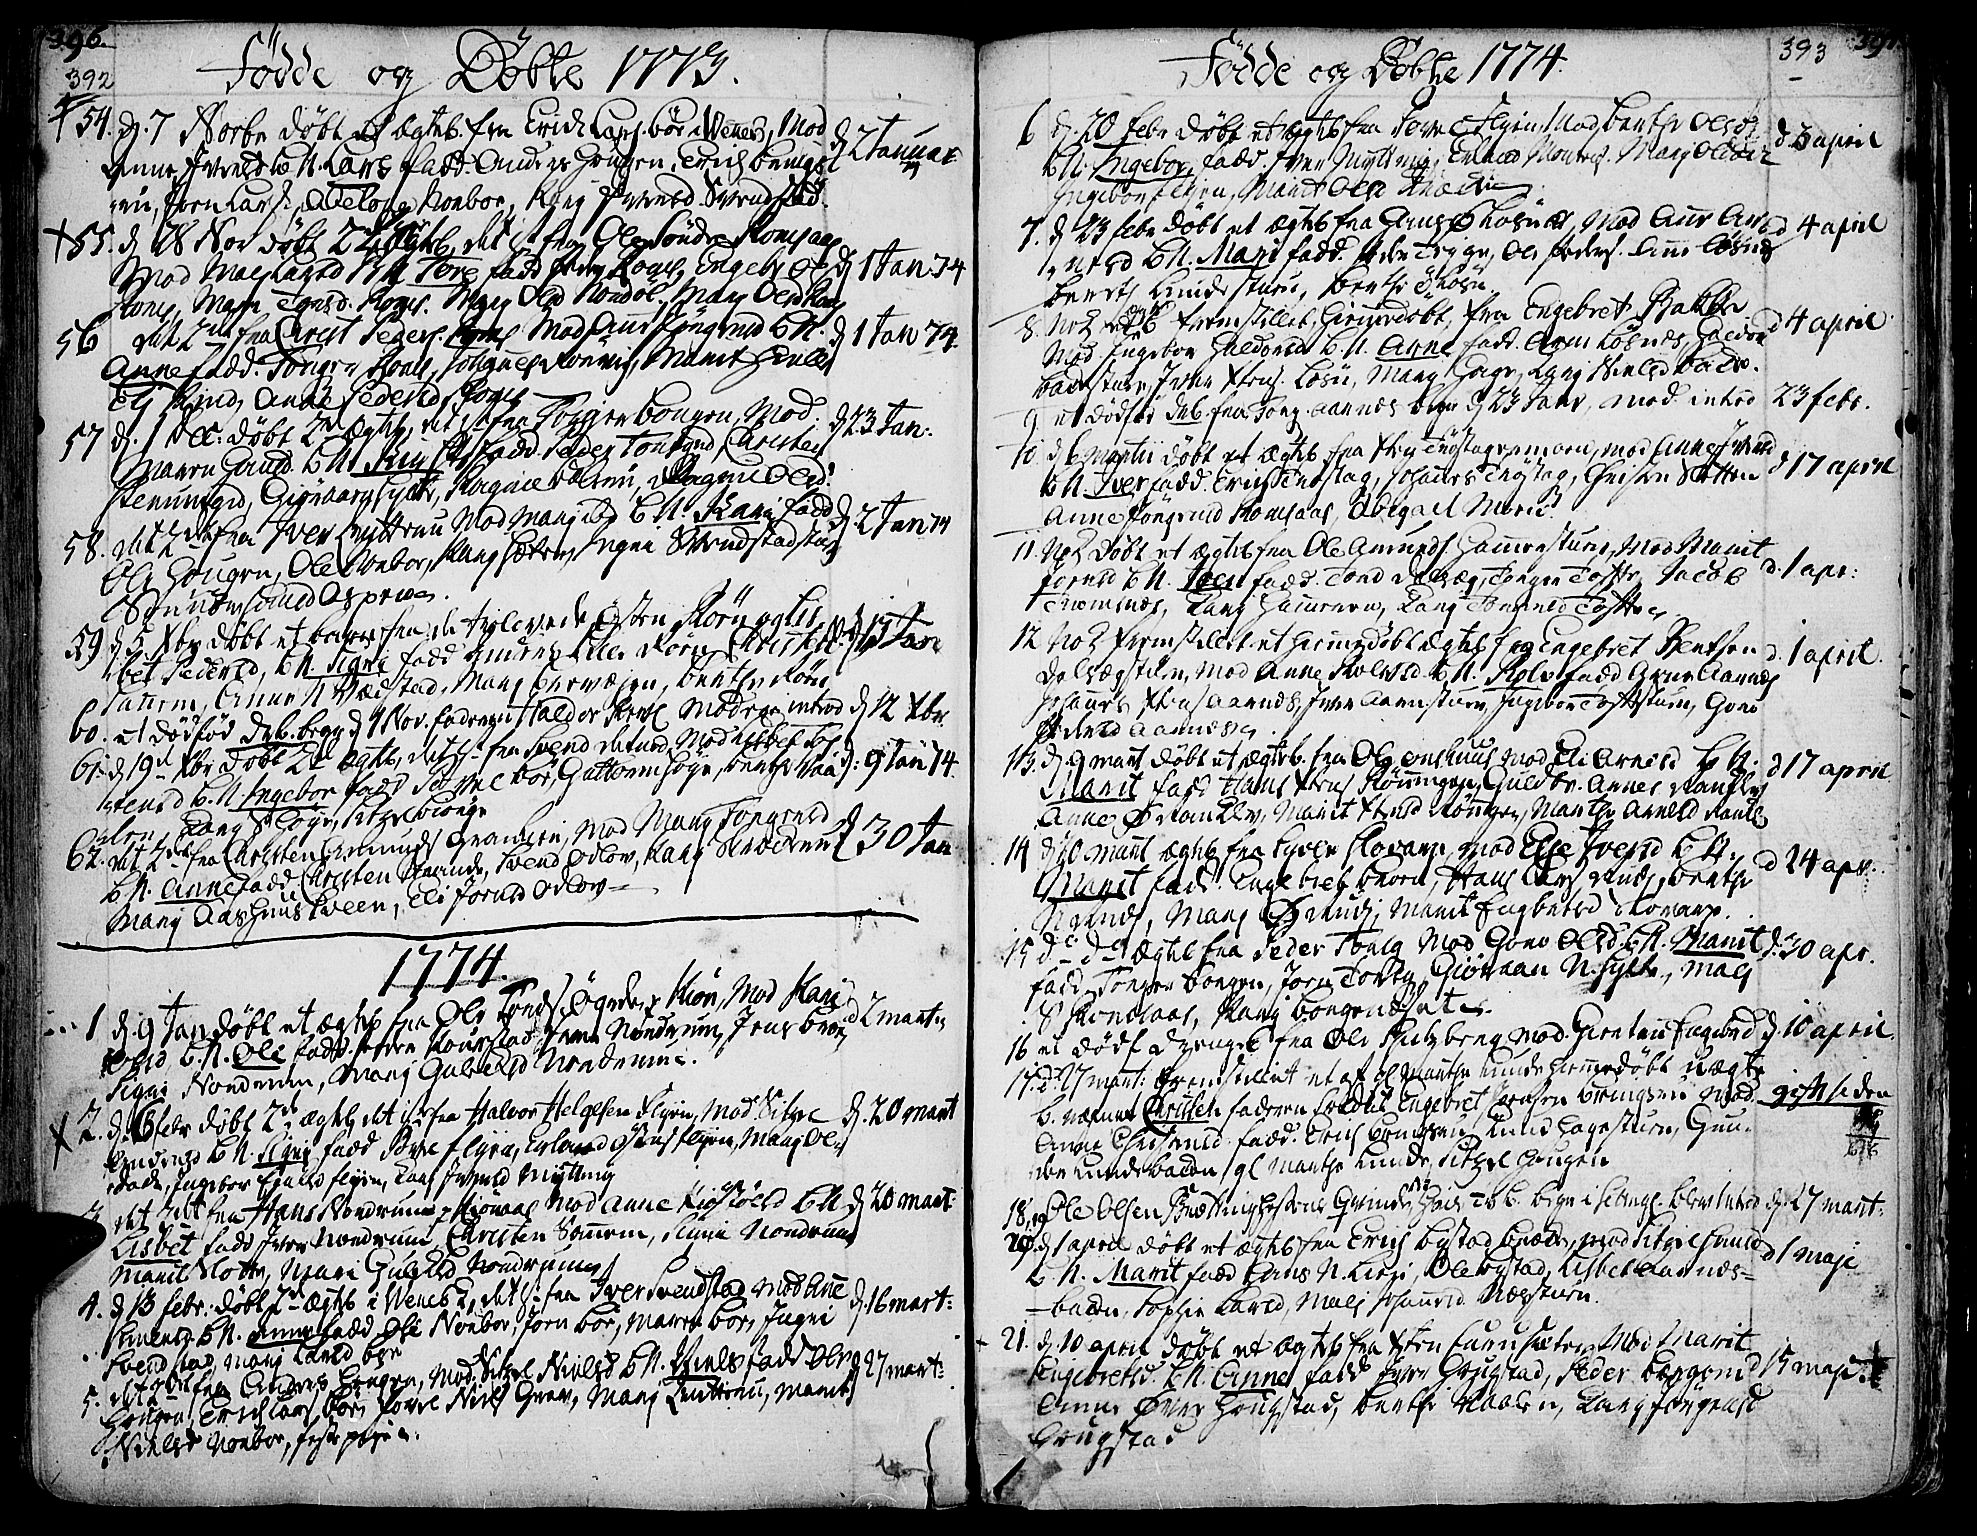 SAH, Ringebu prestekontor, Ministerialbok nr. 2, 1734-1780, s. 392-393